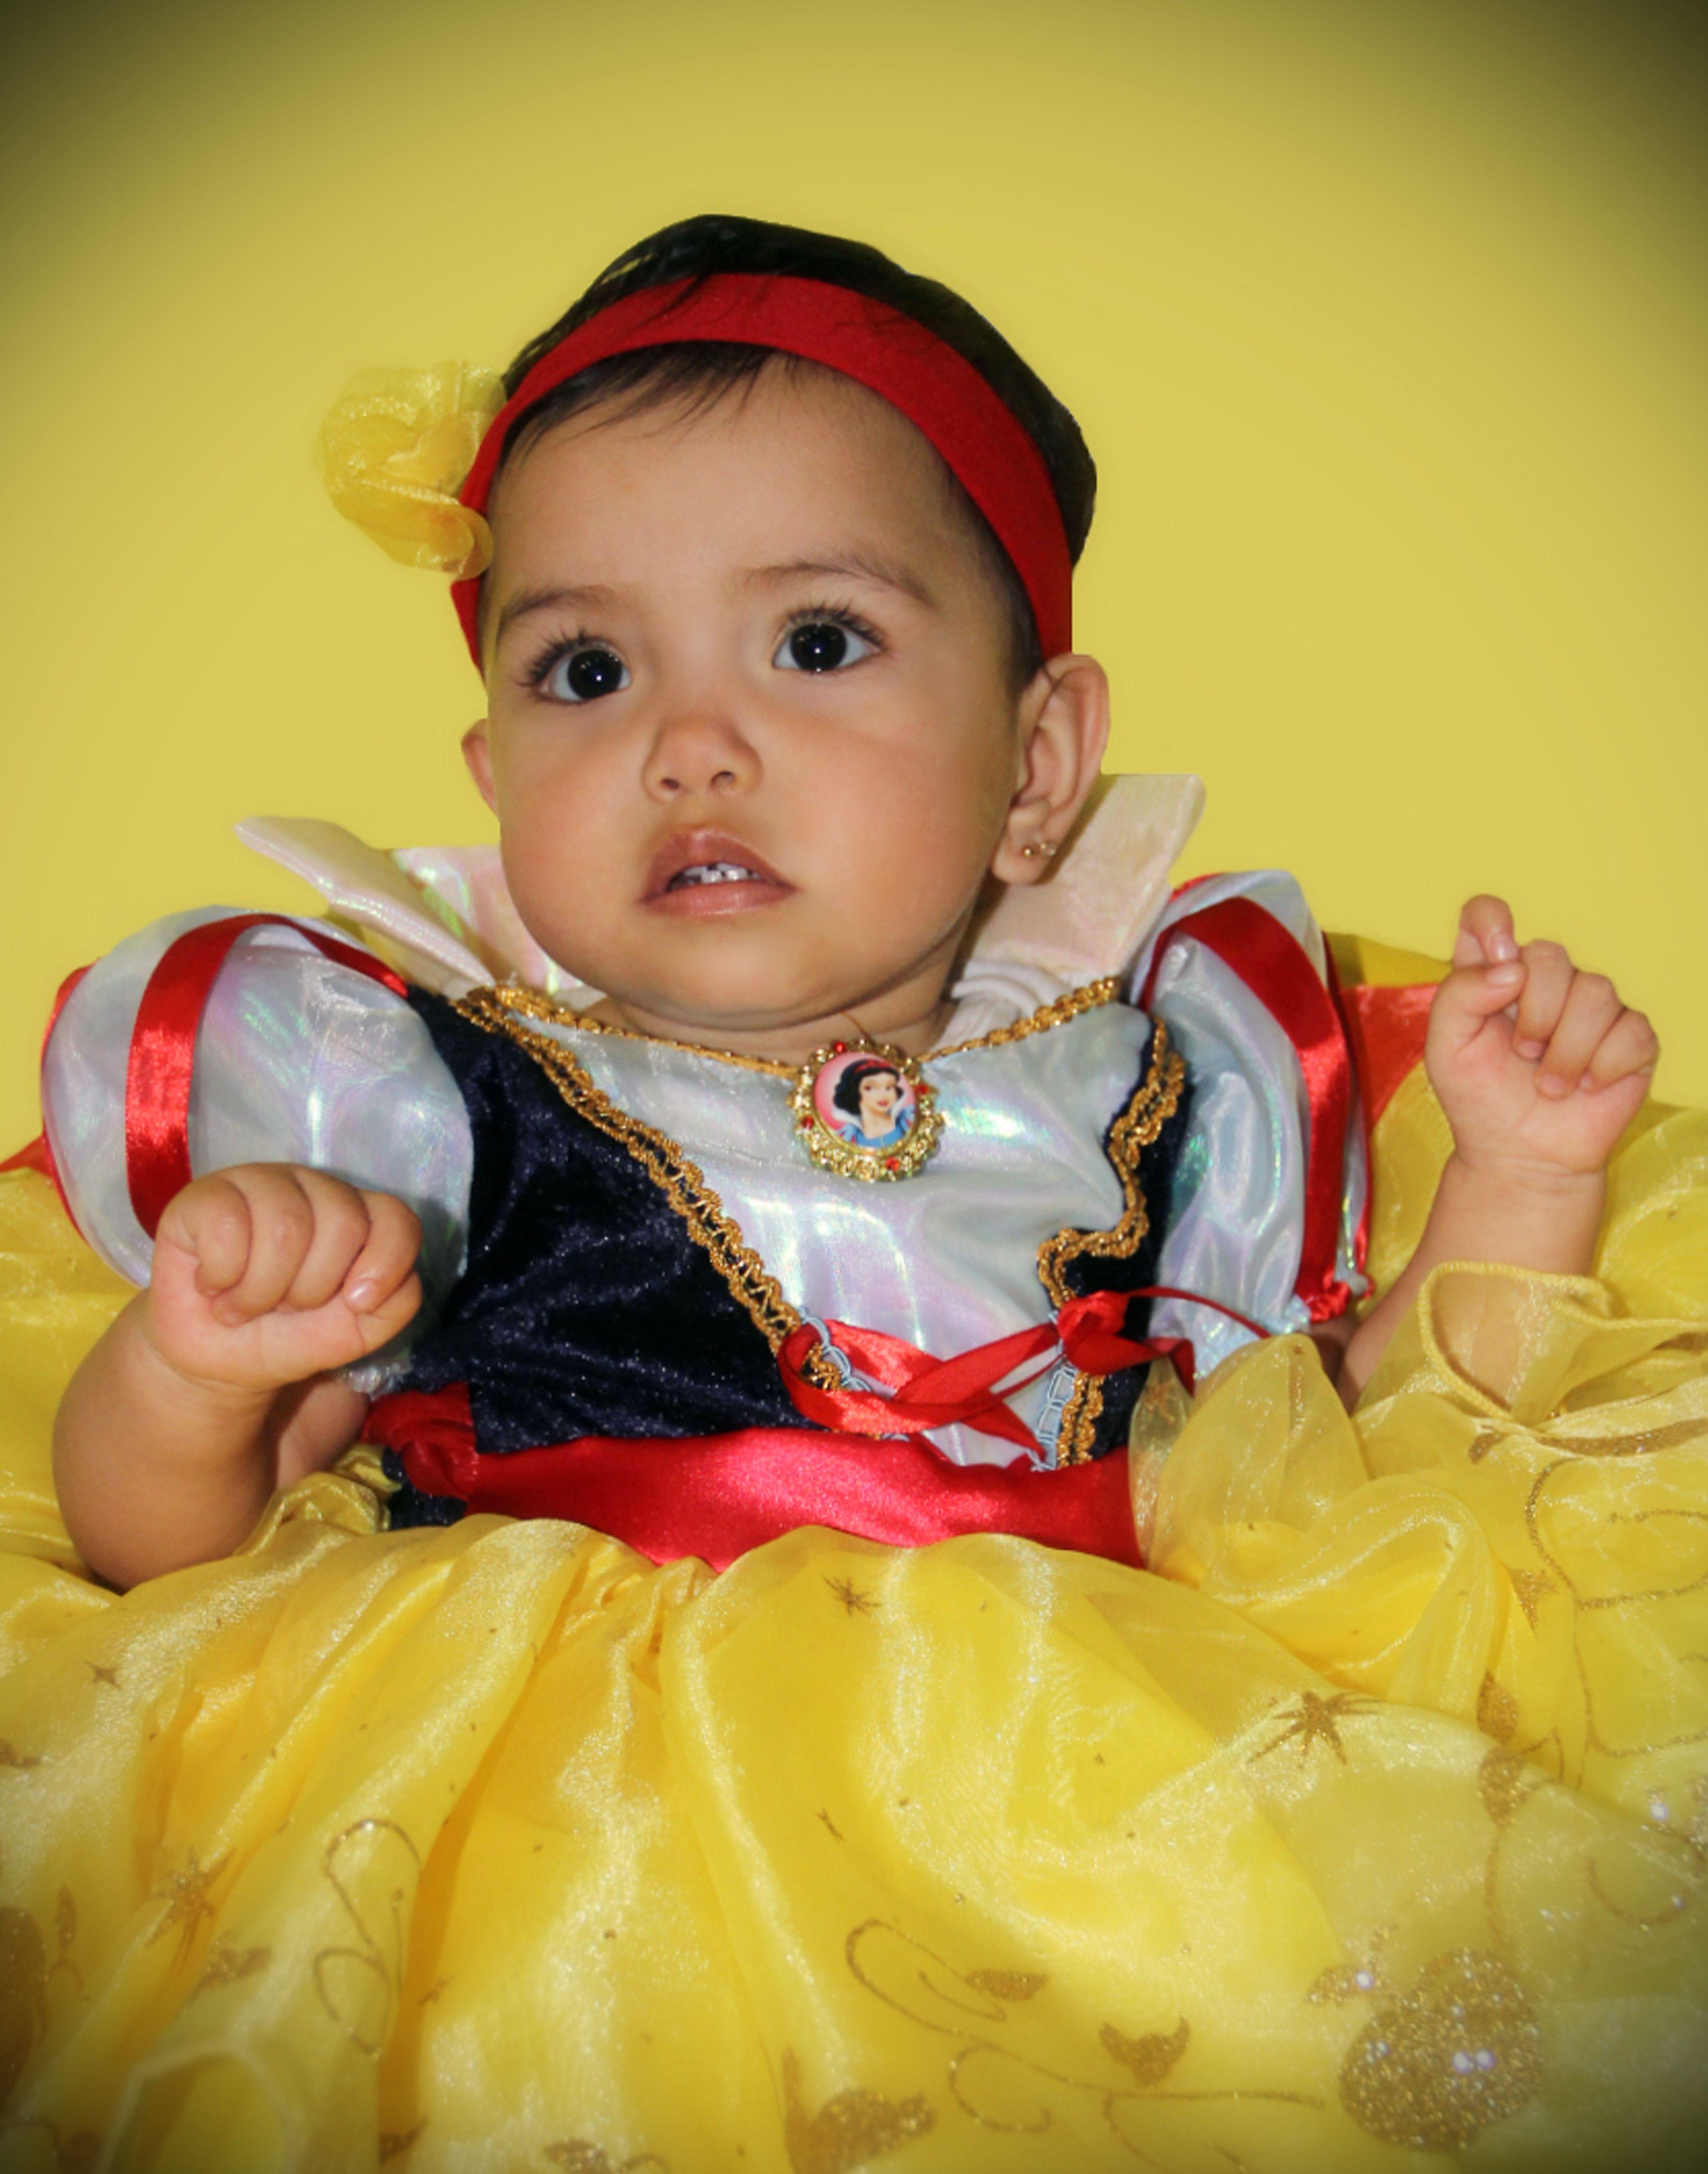 Baby Regina